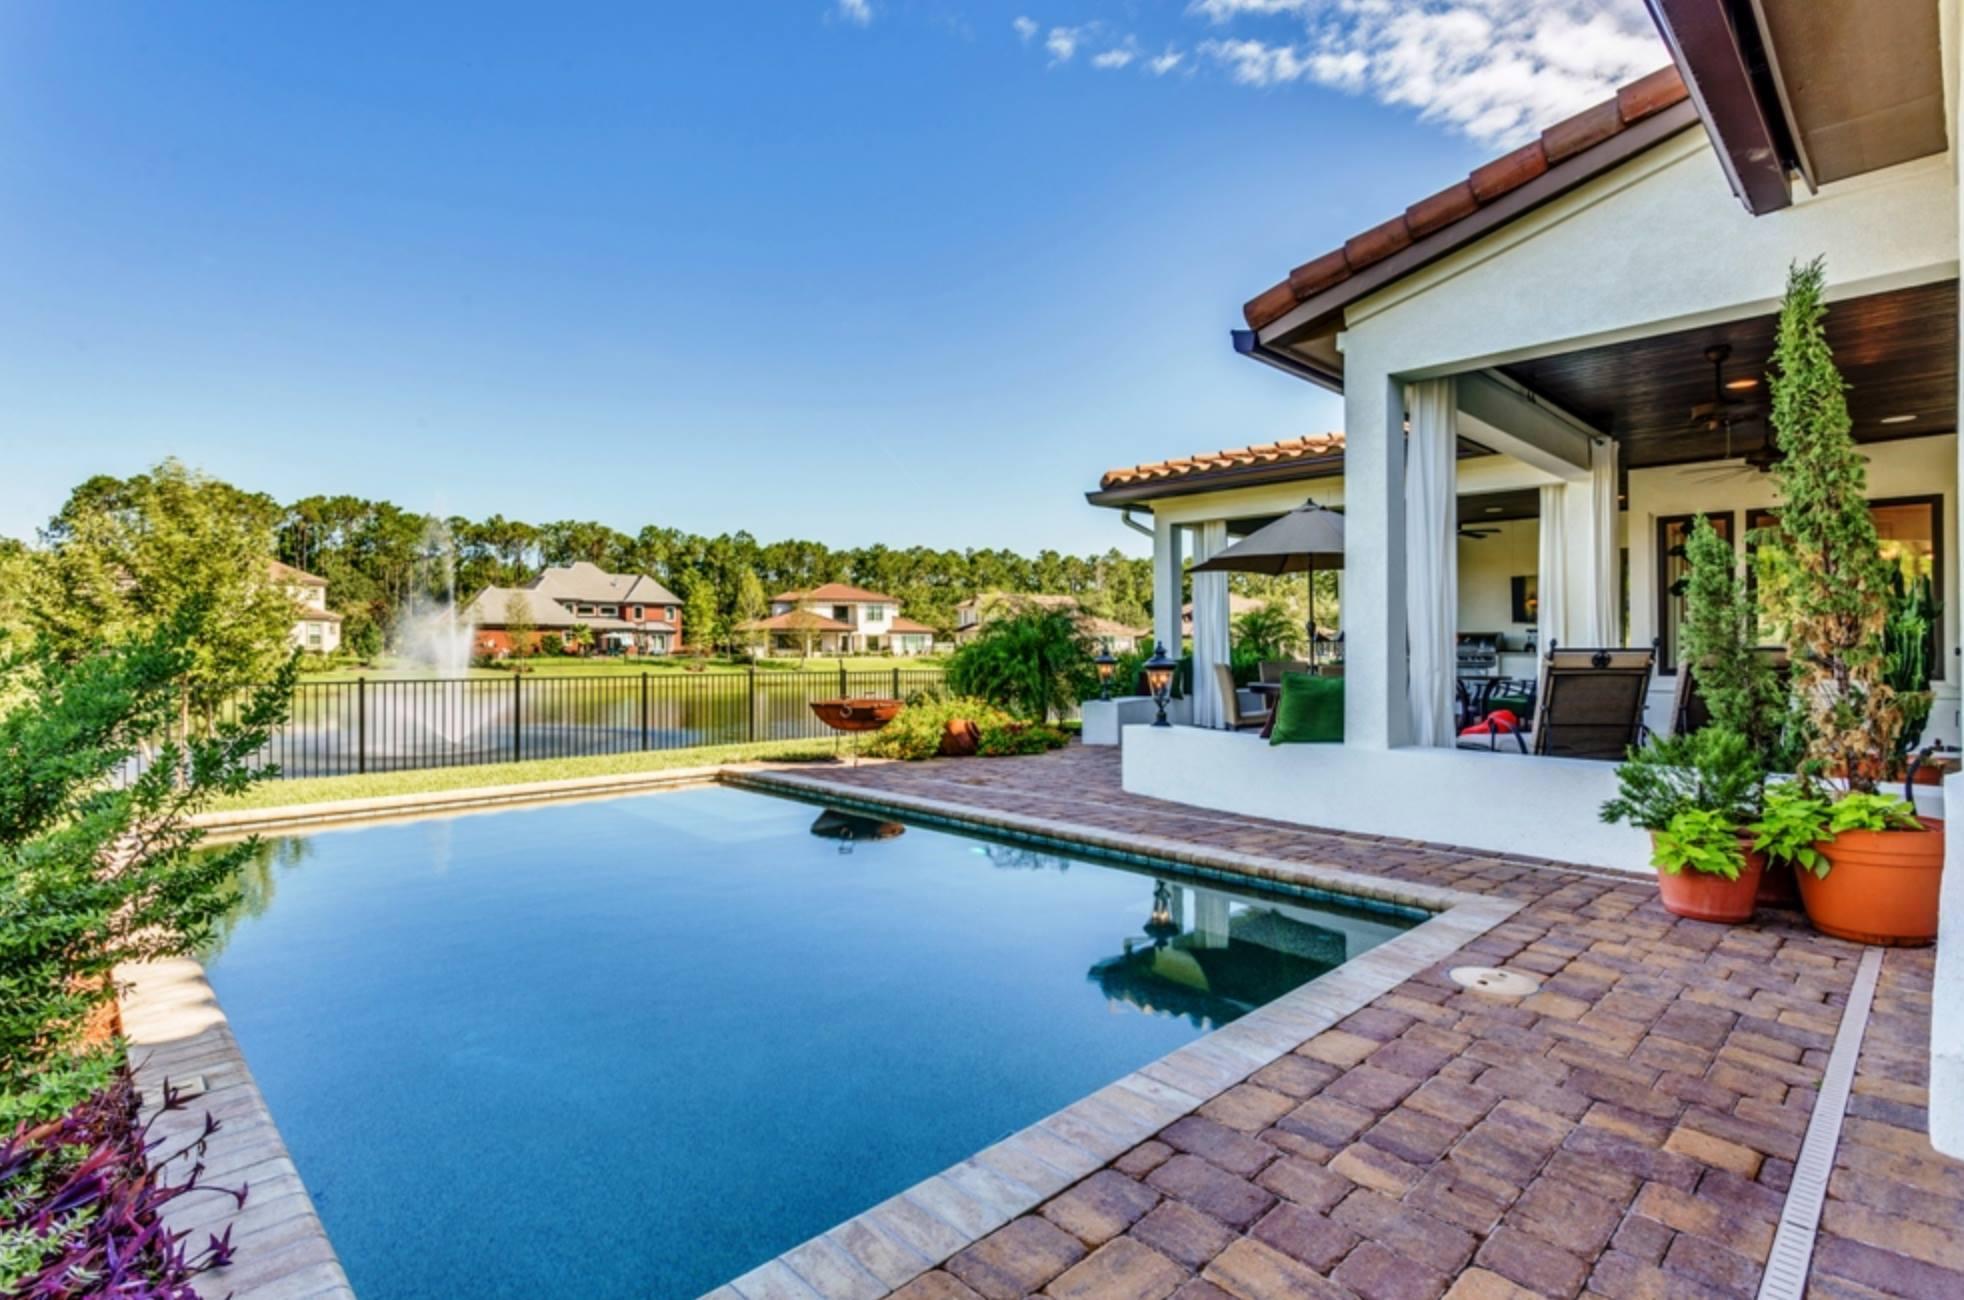 pool homes for sale jacksonville fl